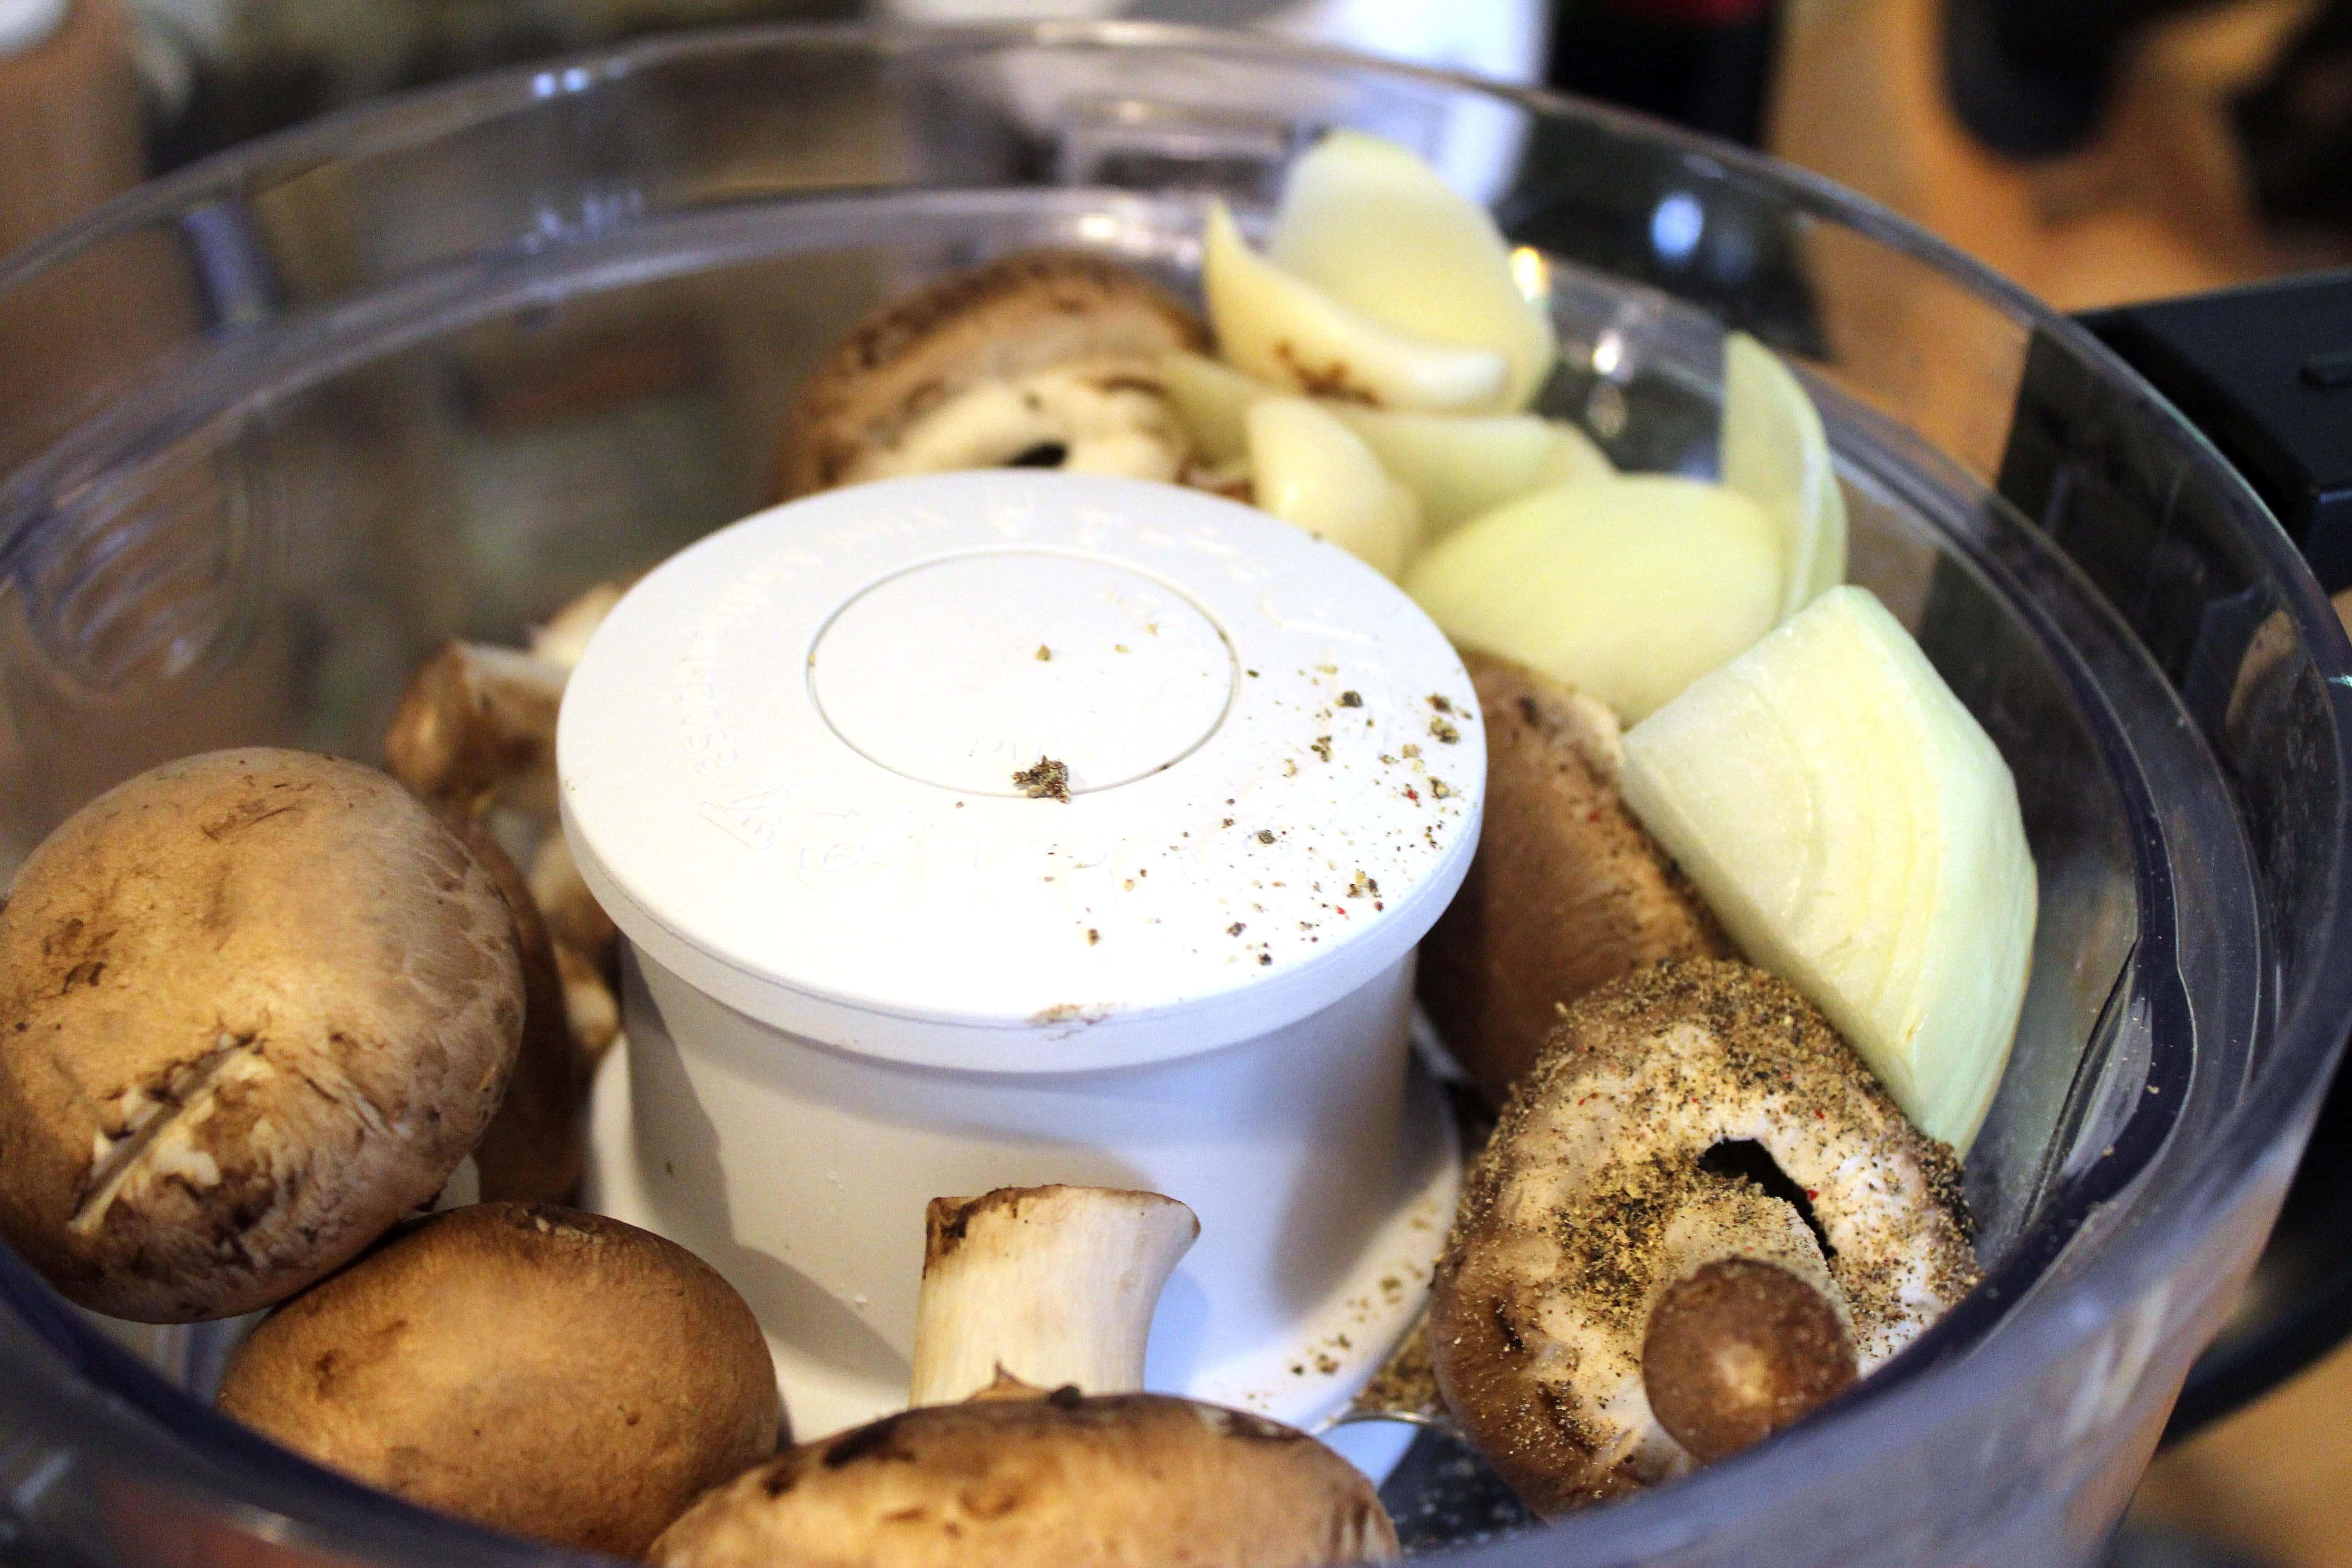 Add veggies to food processor